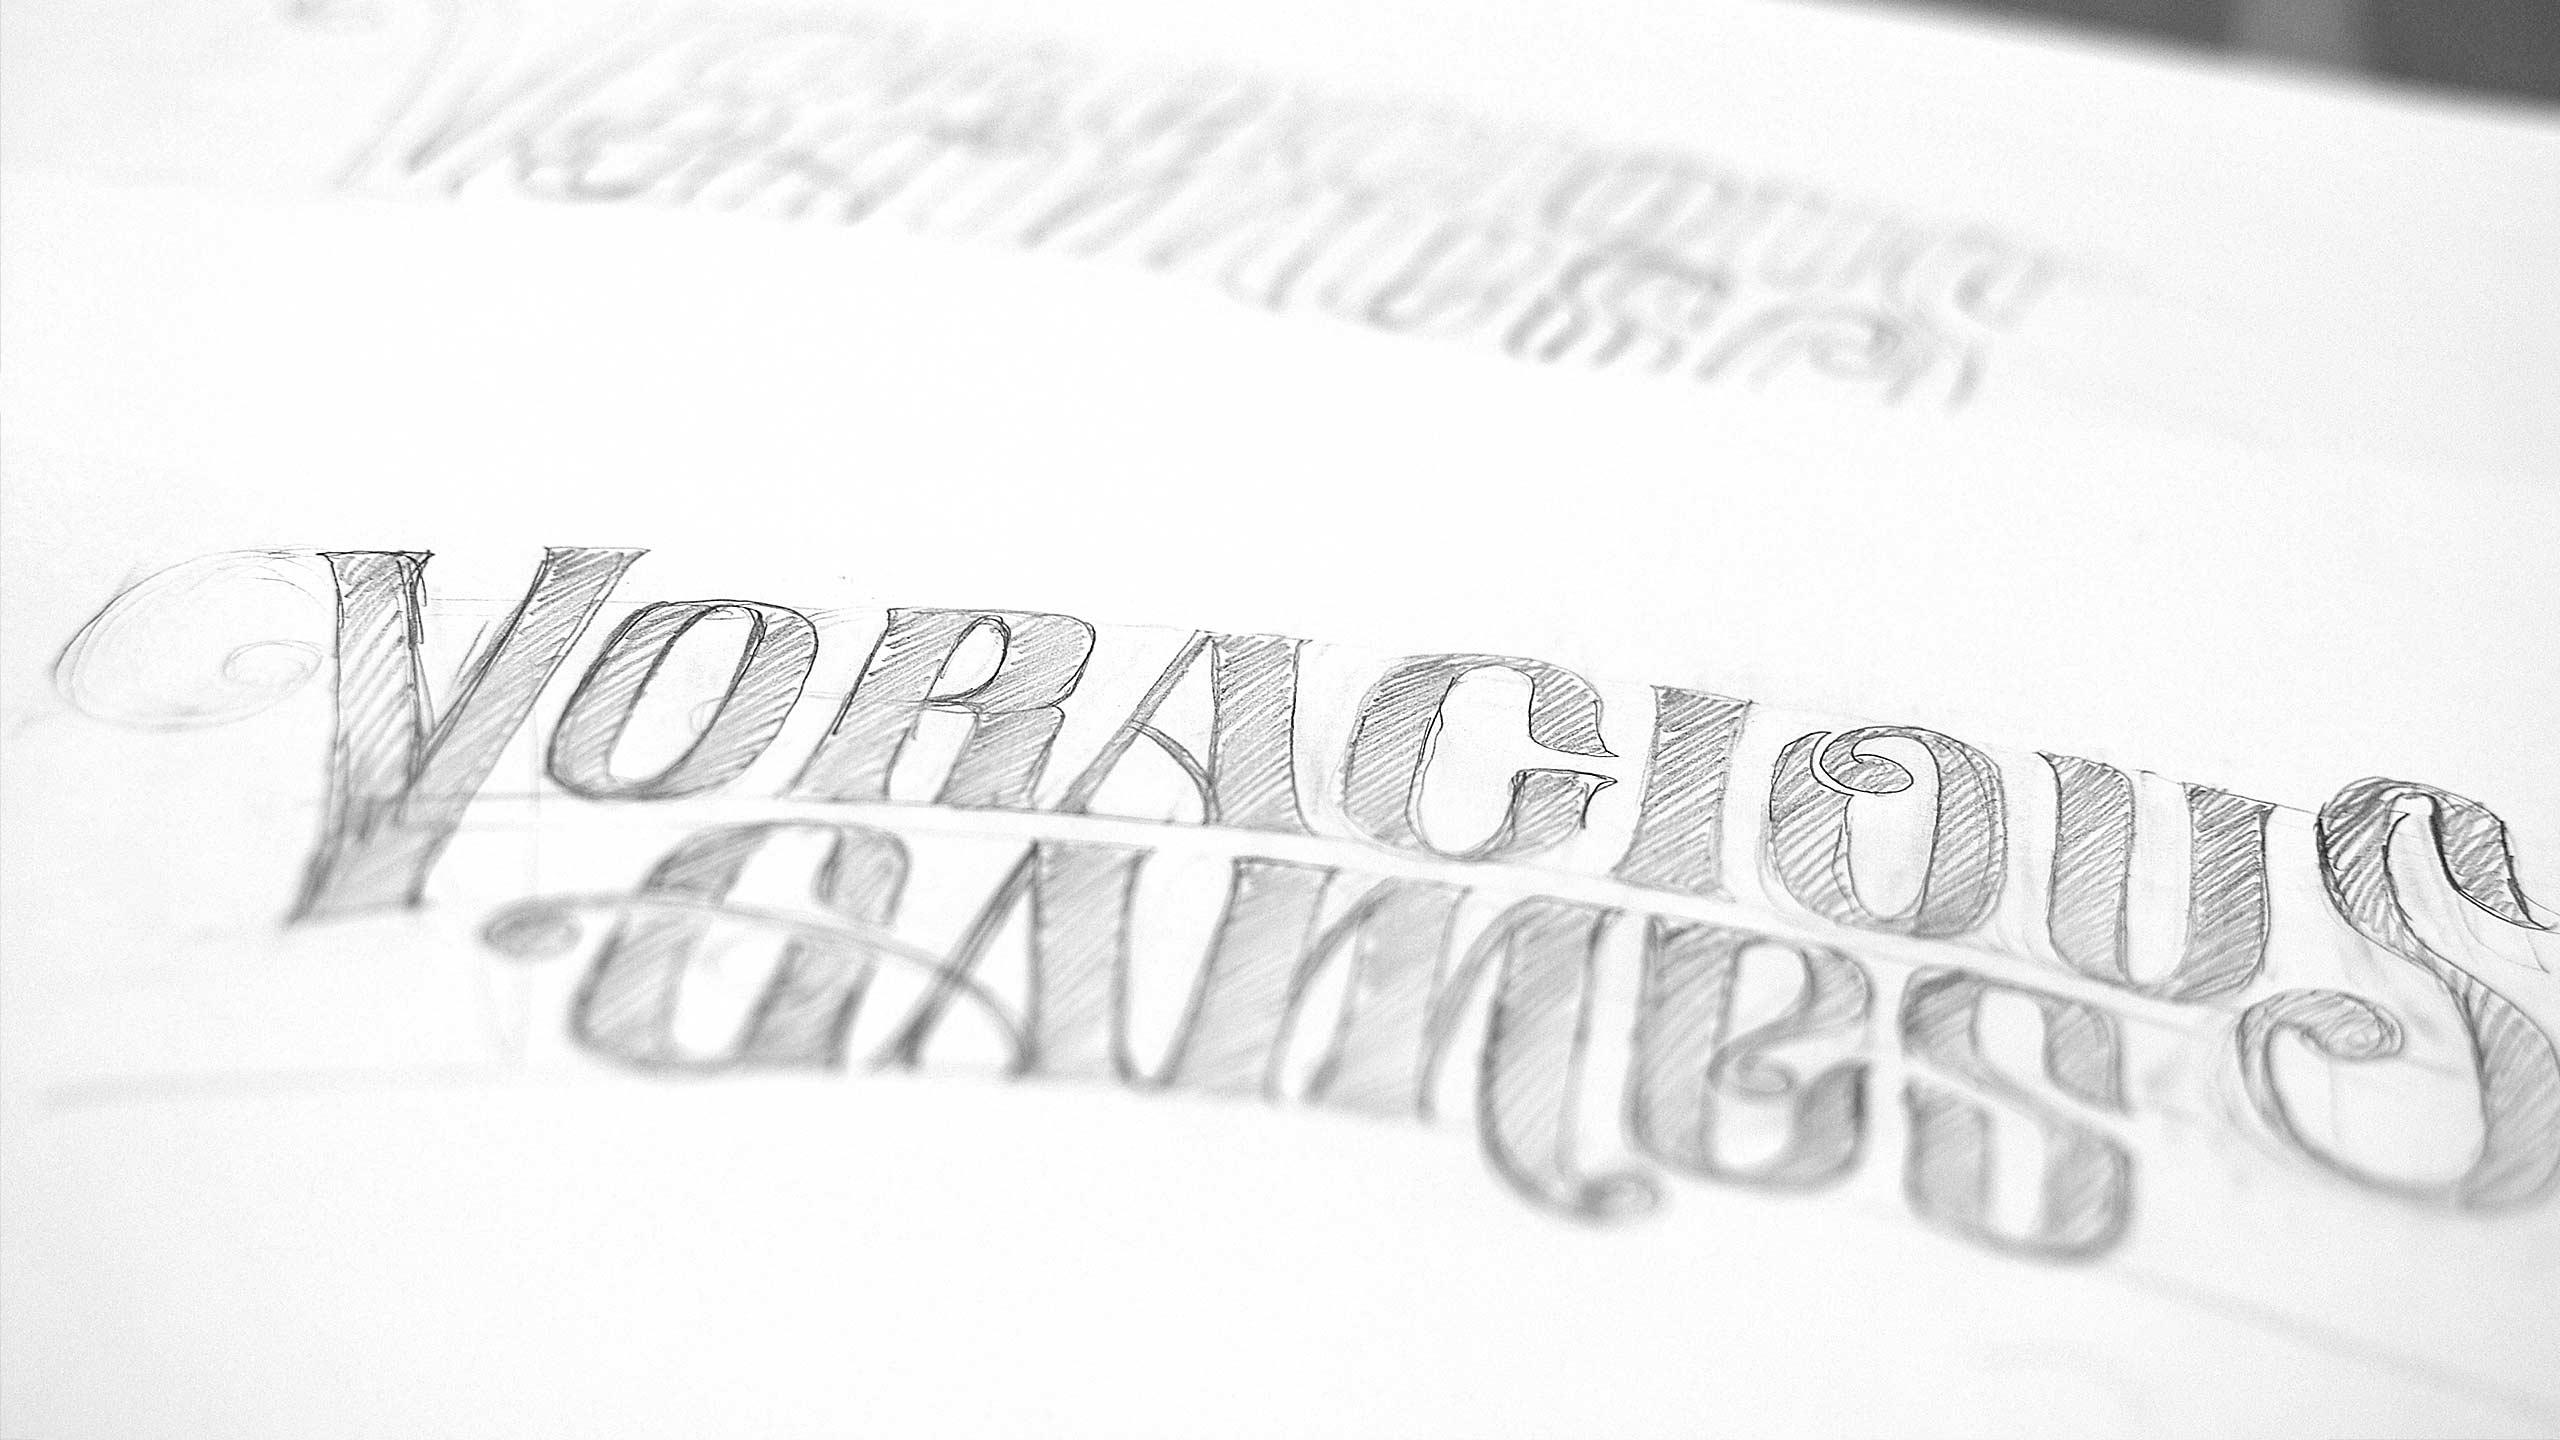 Sketch for Voracious Games